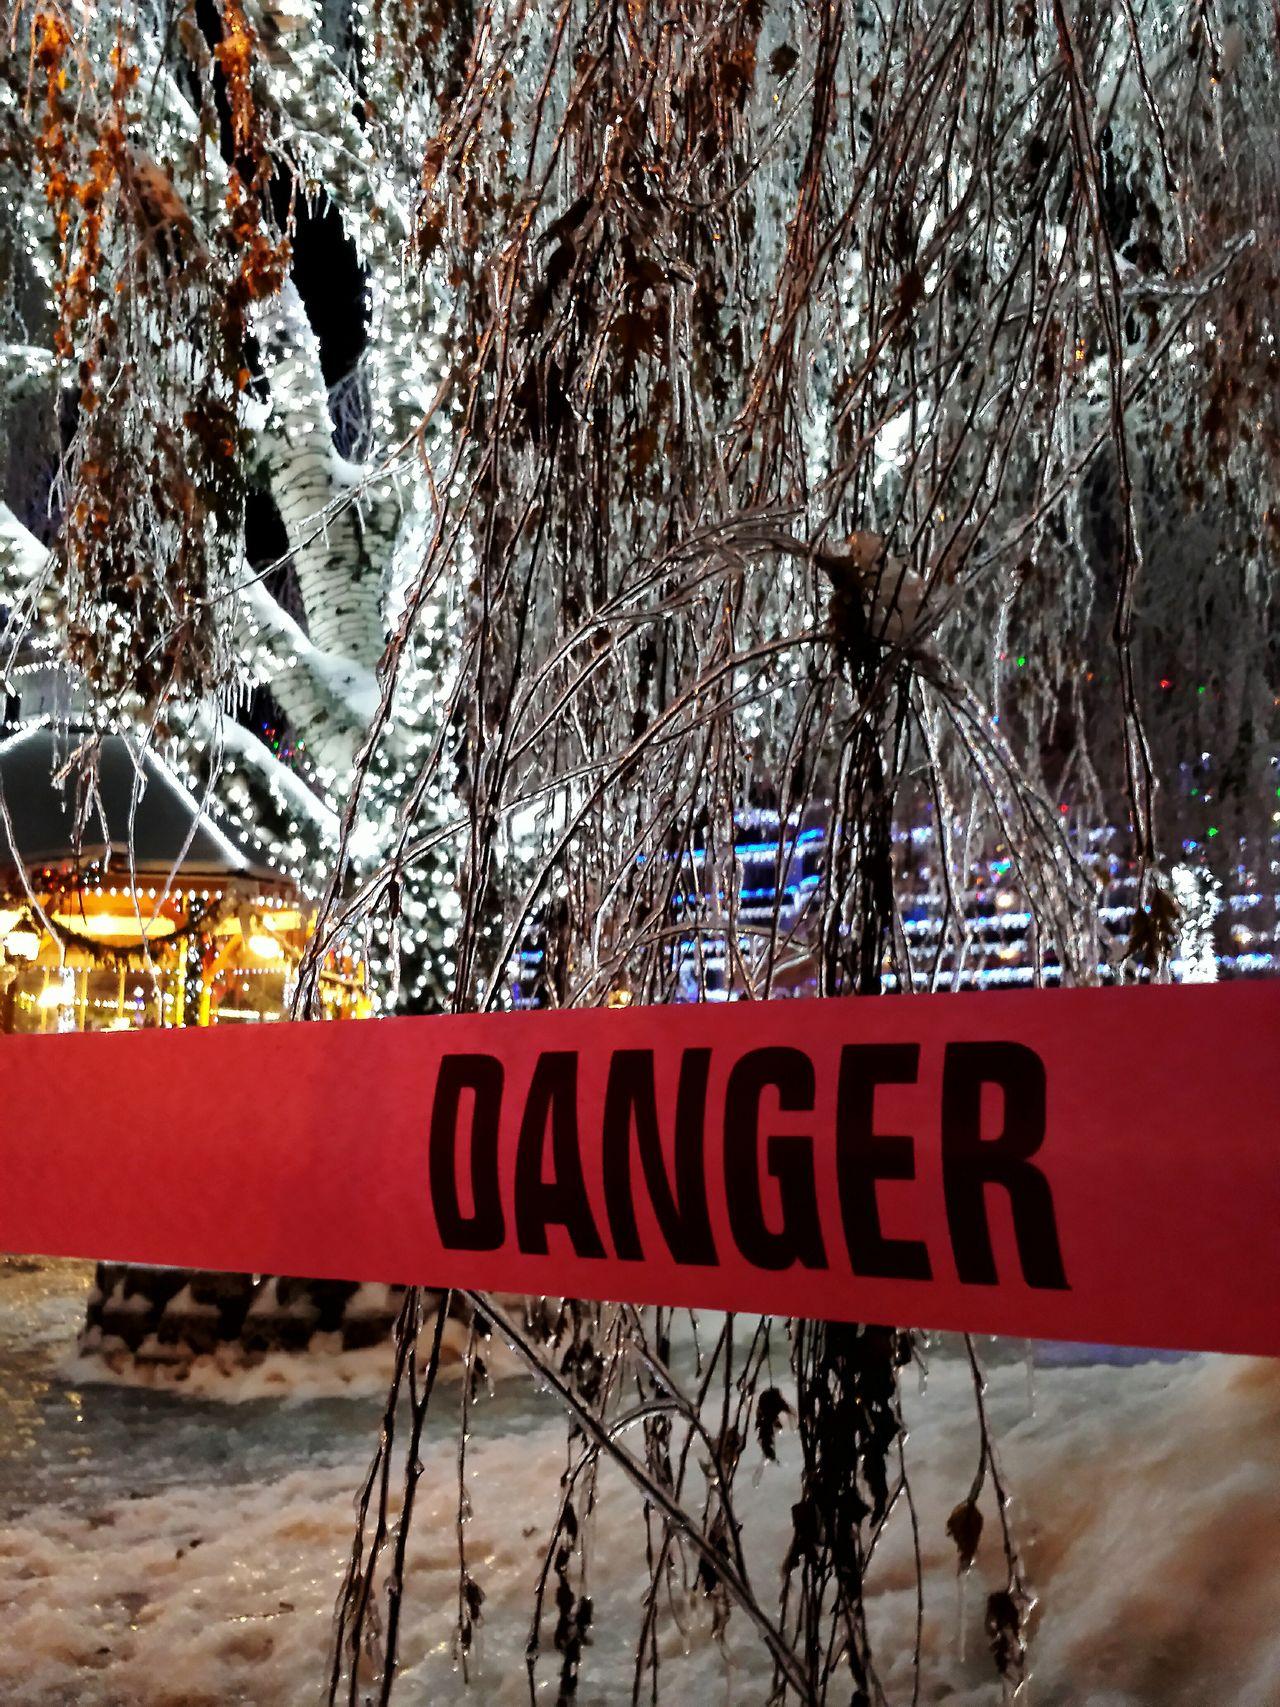 It didn't seem dangerous. Leavenworth Danger Ice Deepfreeze Night Lights Night Photography Trees Winter Wonderland Winter Trees The Photojournalist - 2015 EyeEm Awards